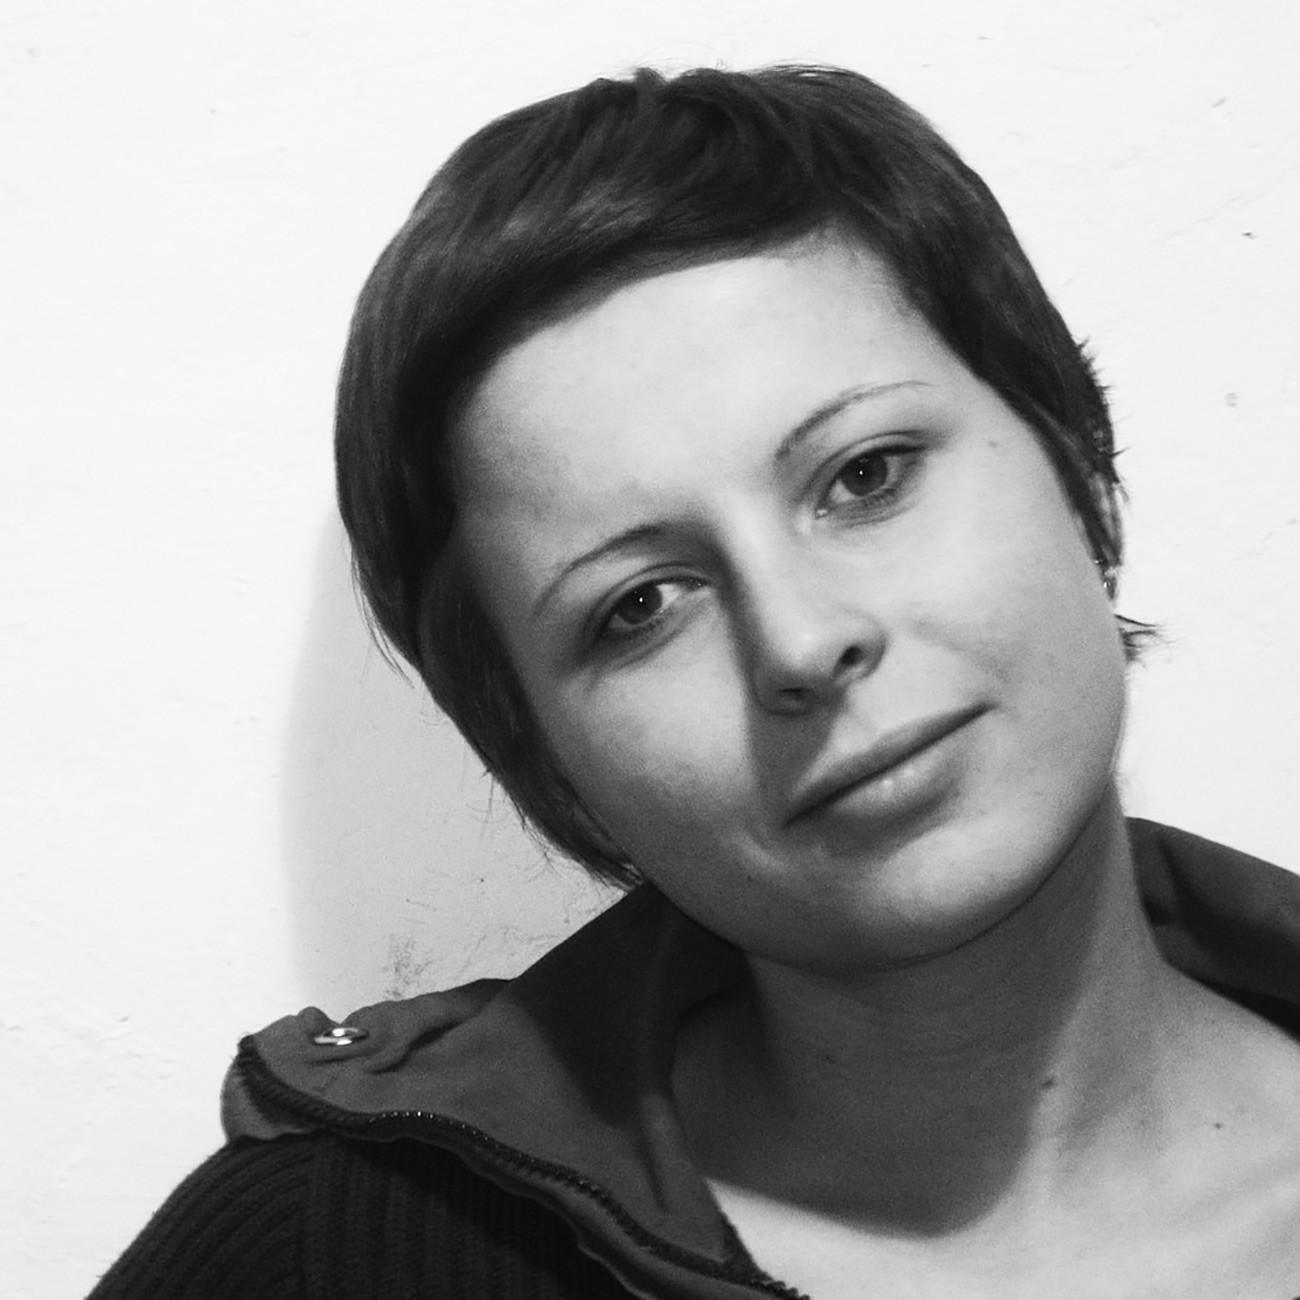 Анна Желудь